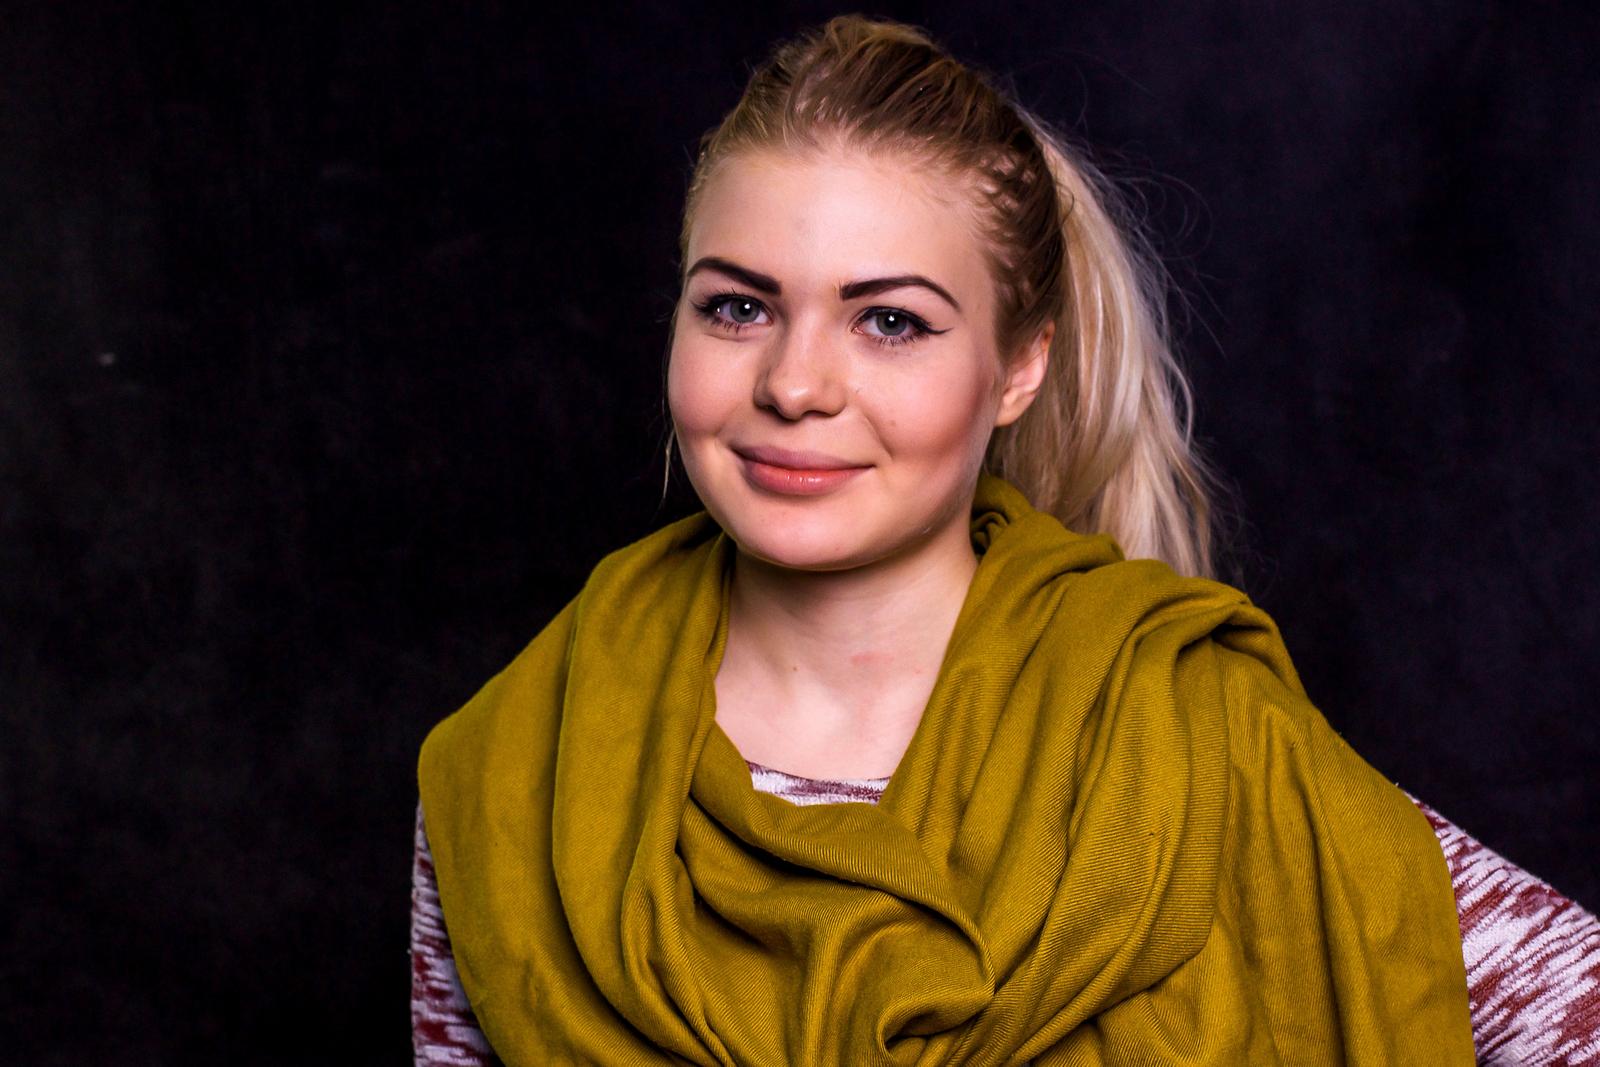 Анна зельцман немка татарка